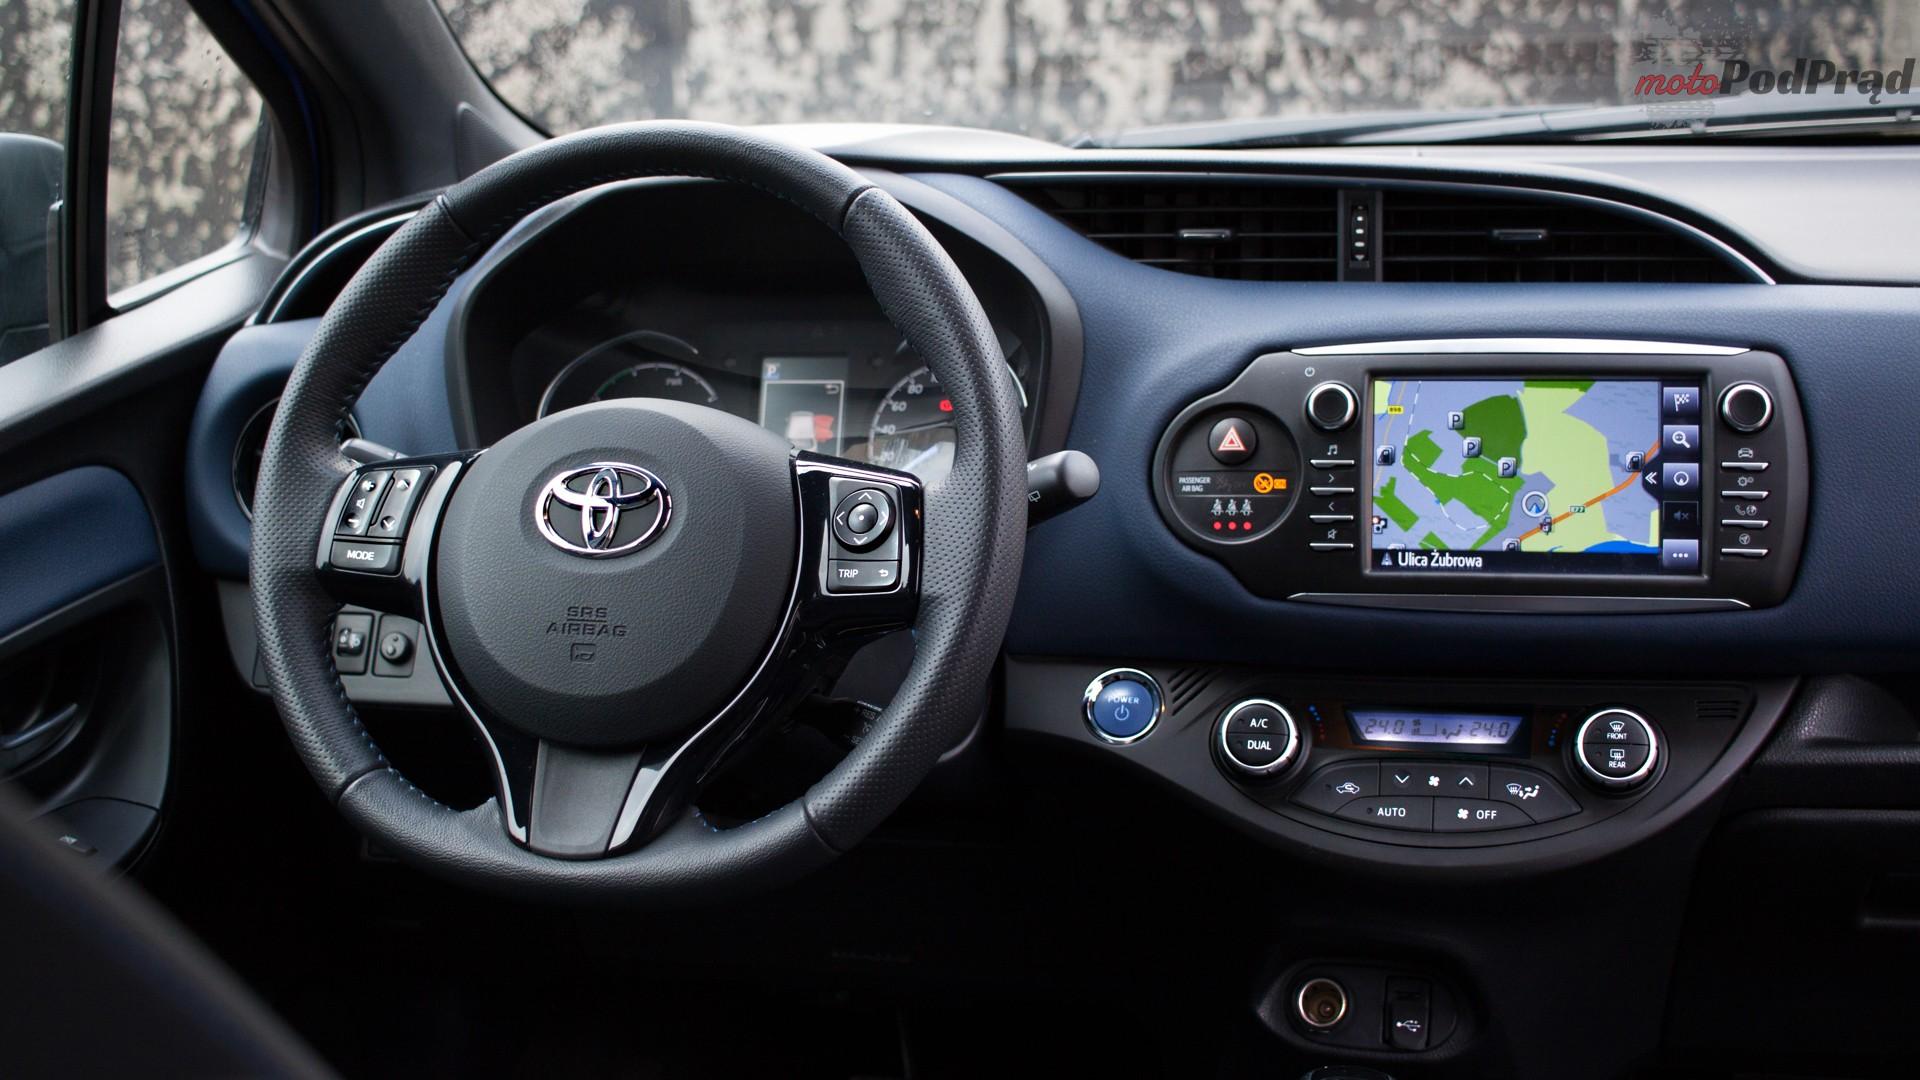 toyota yaris hybrydowa hybrid 2017 selection kierownica ekran nawigacja Test: Toyota Yaris Hybrid Selection   chłodna kalkulacja?